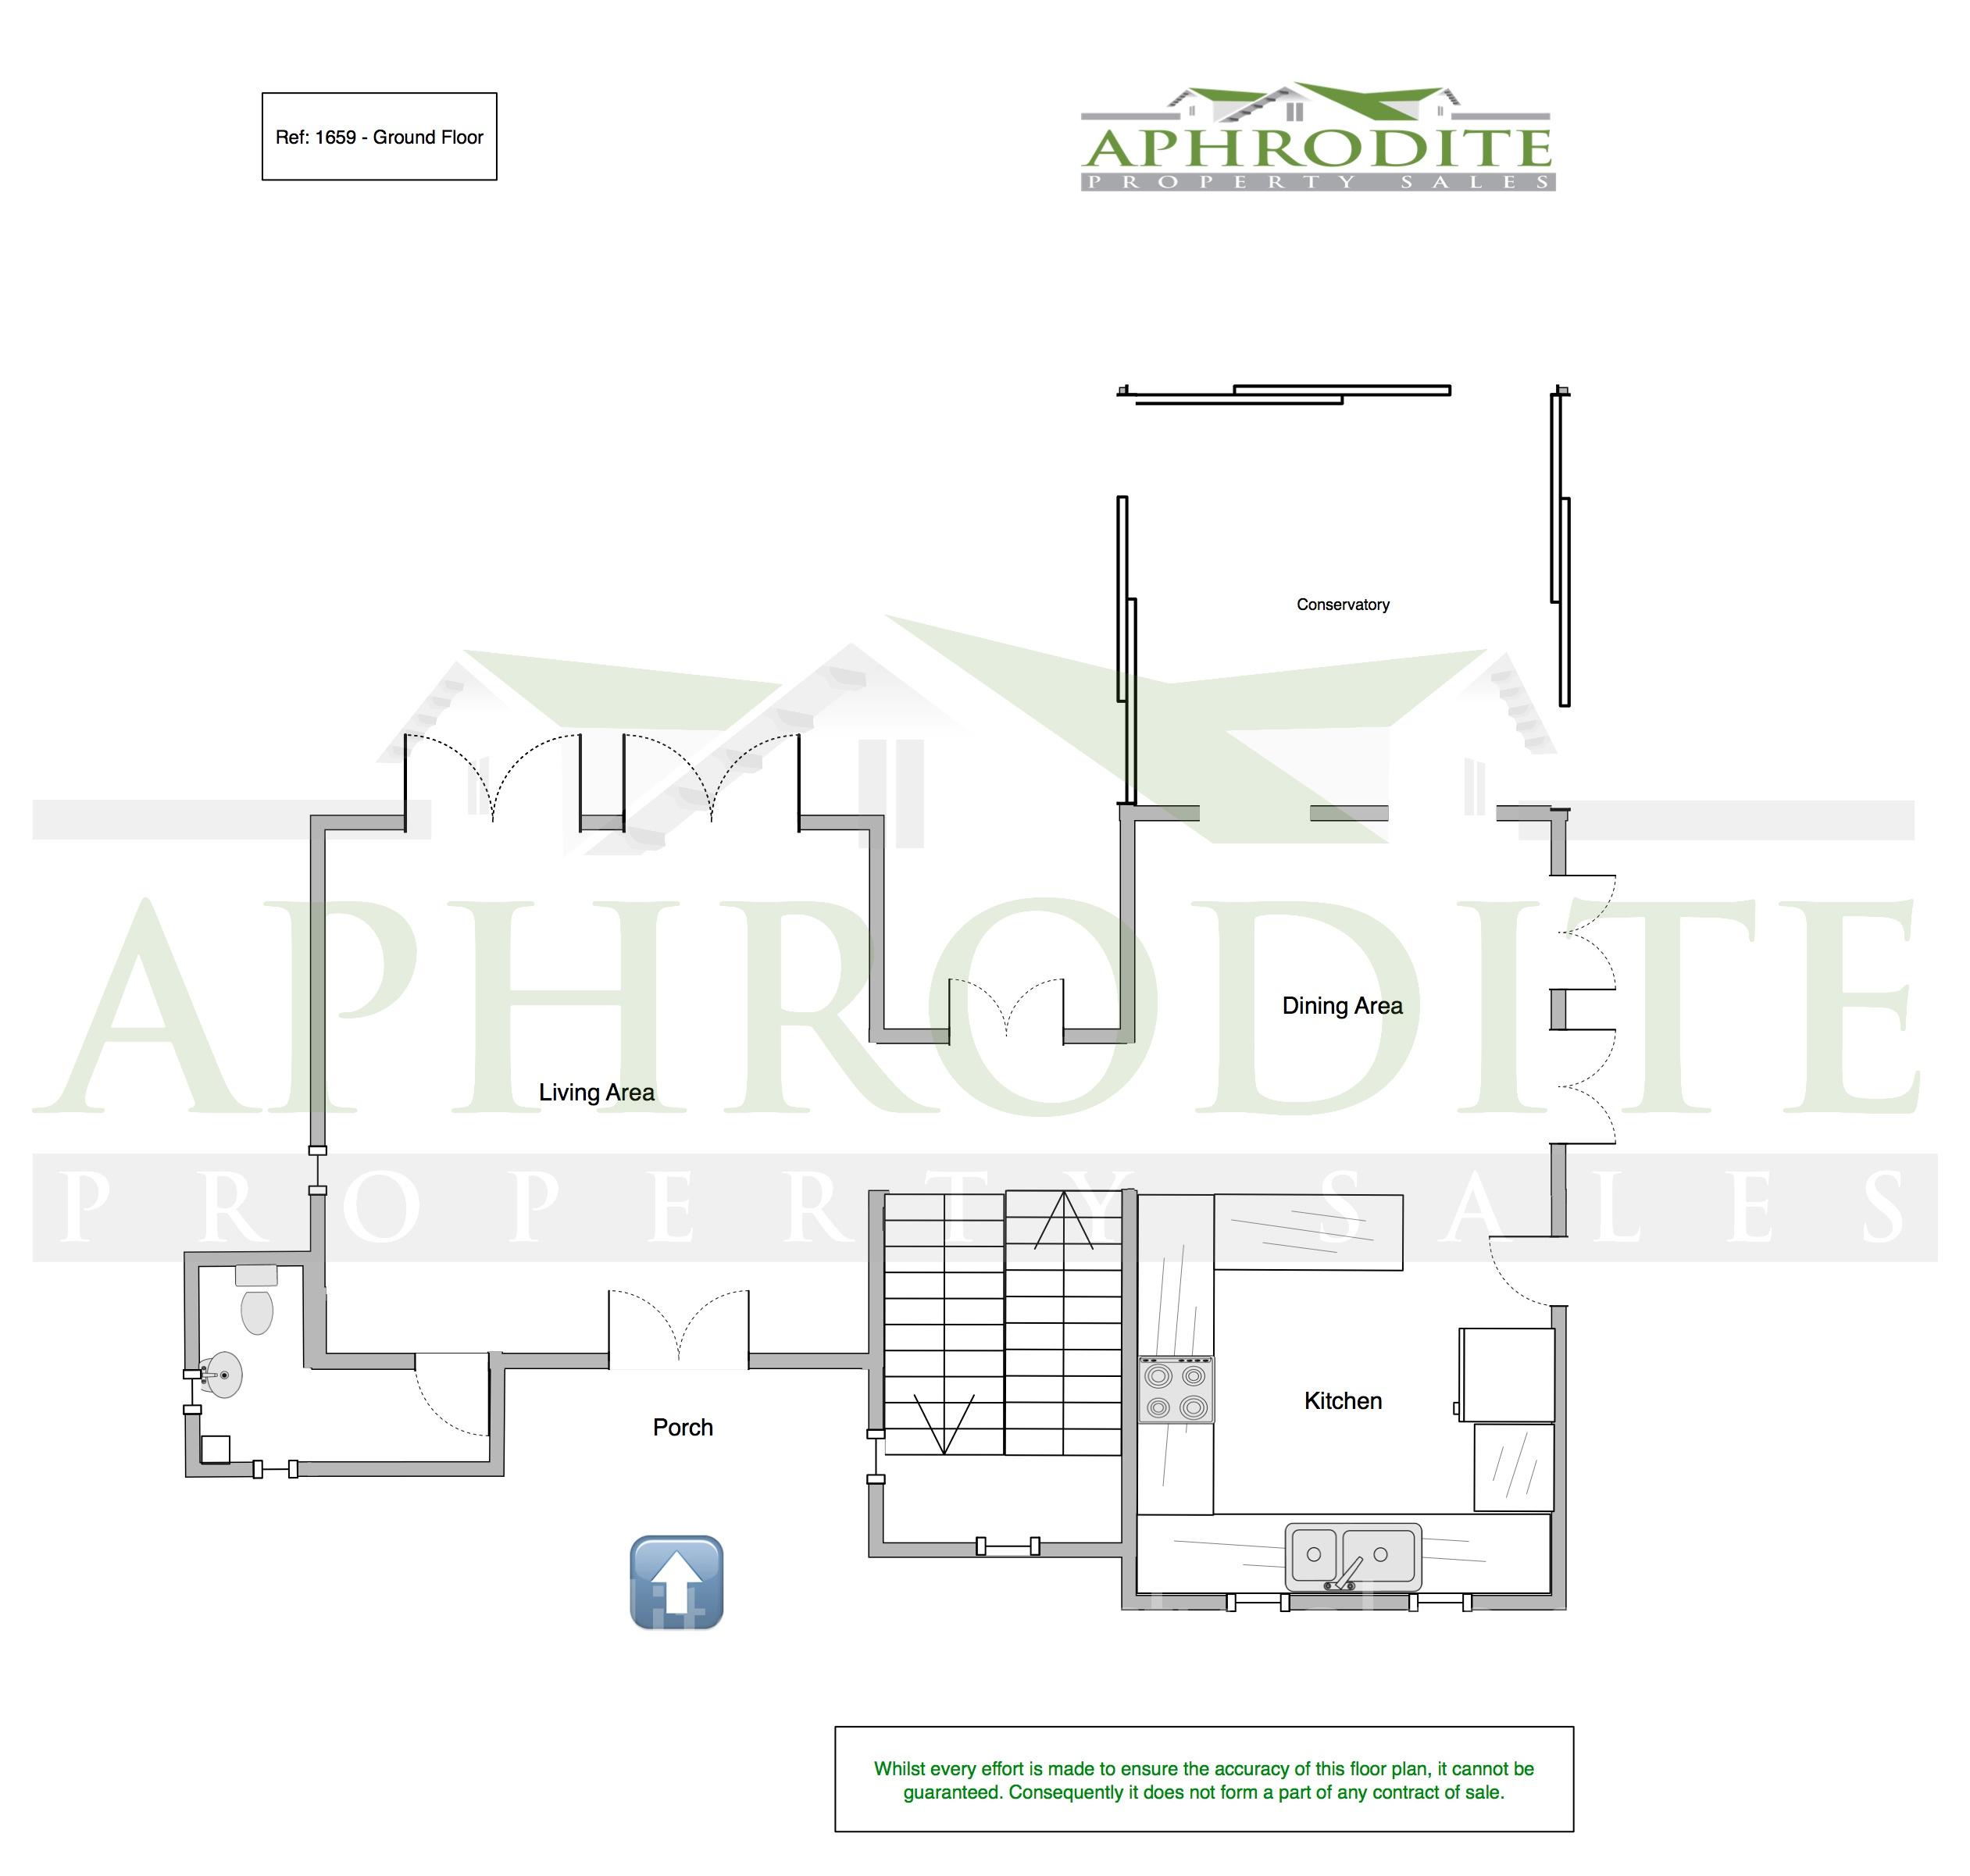 1659 - 3 Bedroom Villa - Aphrodite Hills floorplan